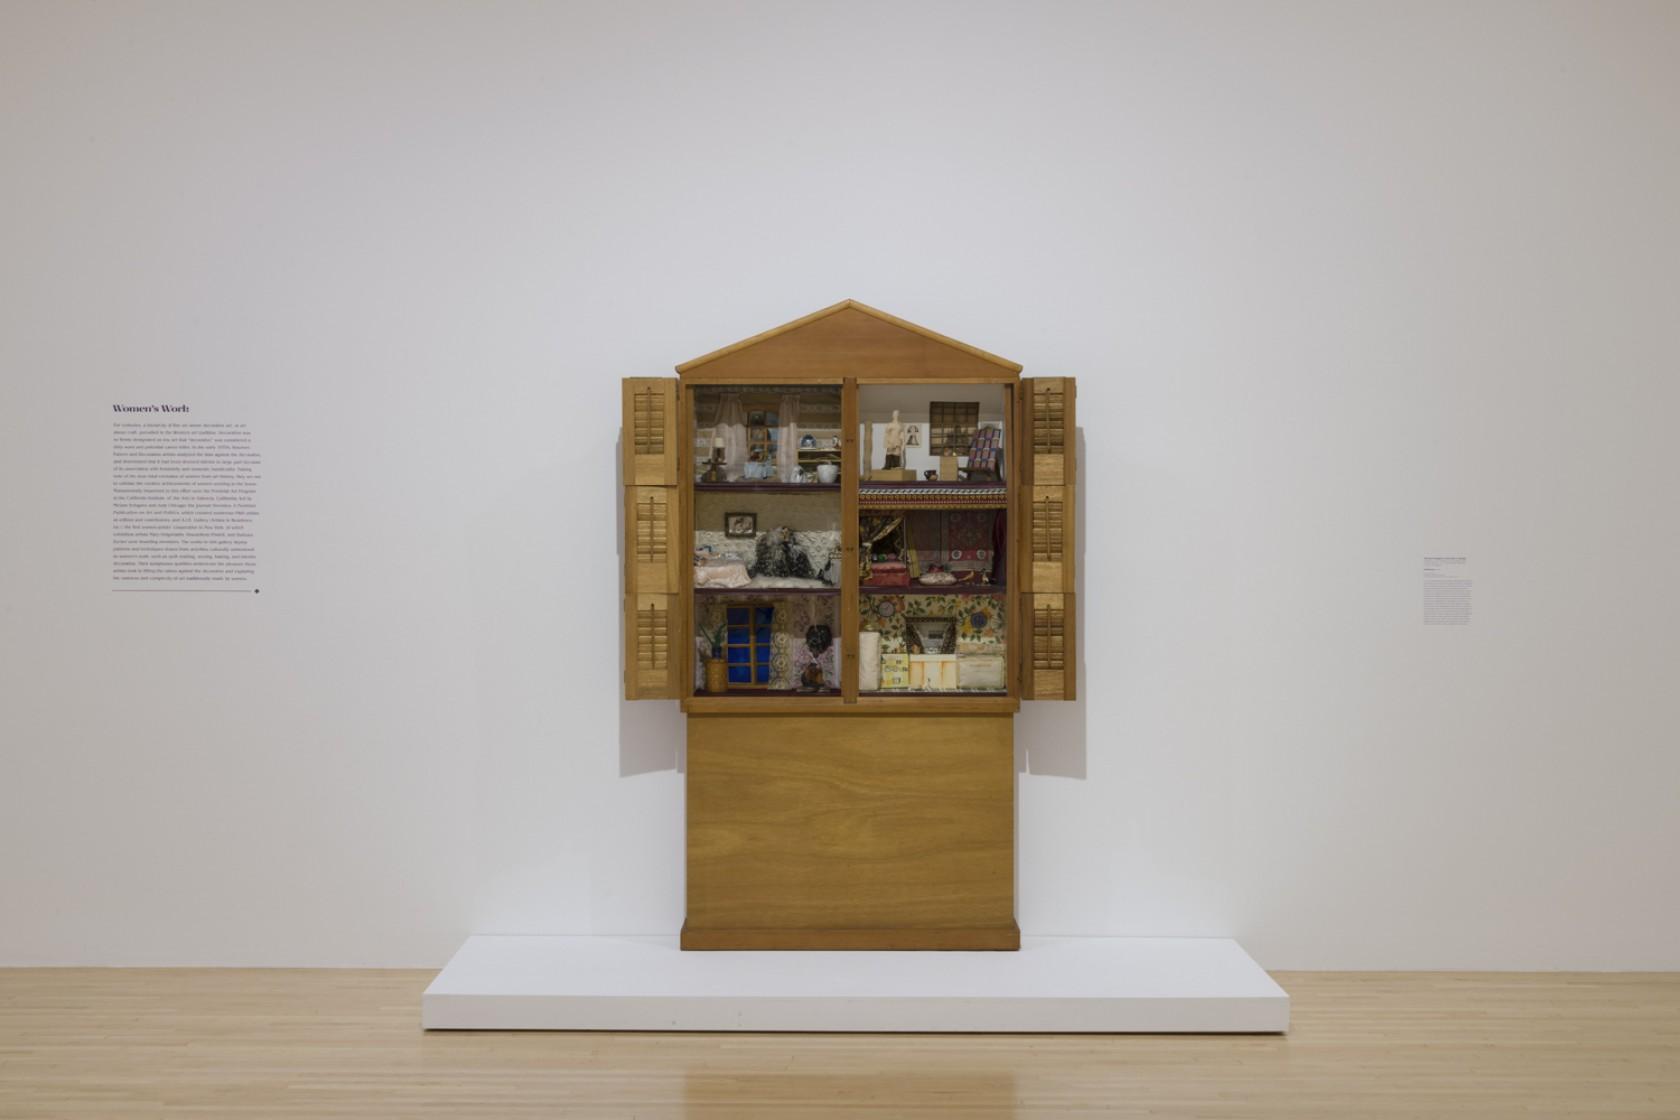 Miriam Schapiro with Sherry Brody, Dollhouse, 1972, wood, mixed media, 79 3/4 × 82 × 8 1/2 in. (202.57 × 208.28 × 21.59 cm). Smithsonian American Art Museum. Museum purchase through the Gene Davis Memorial Fund.